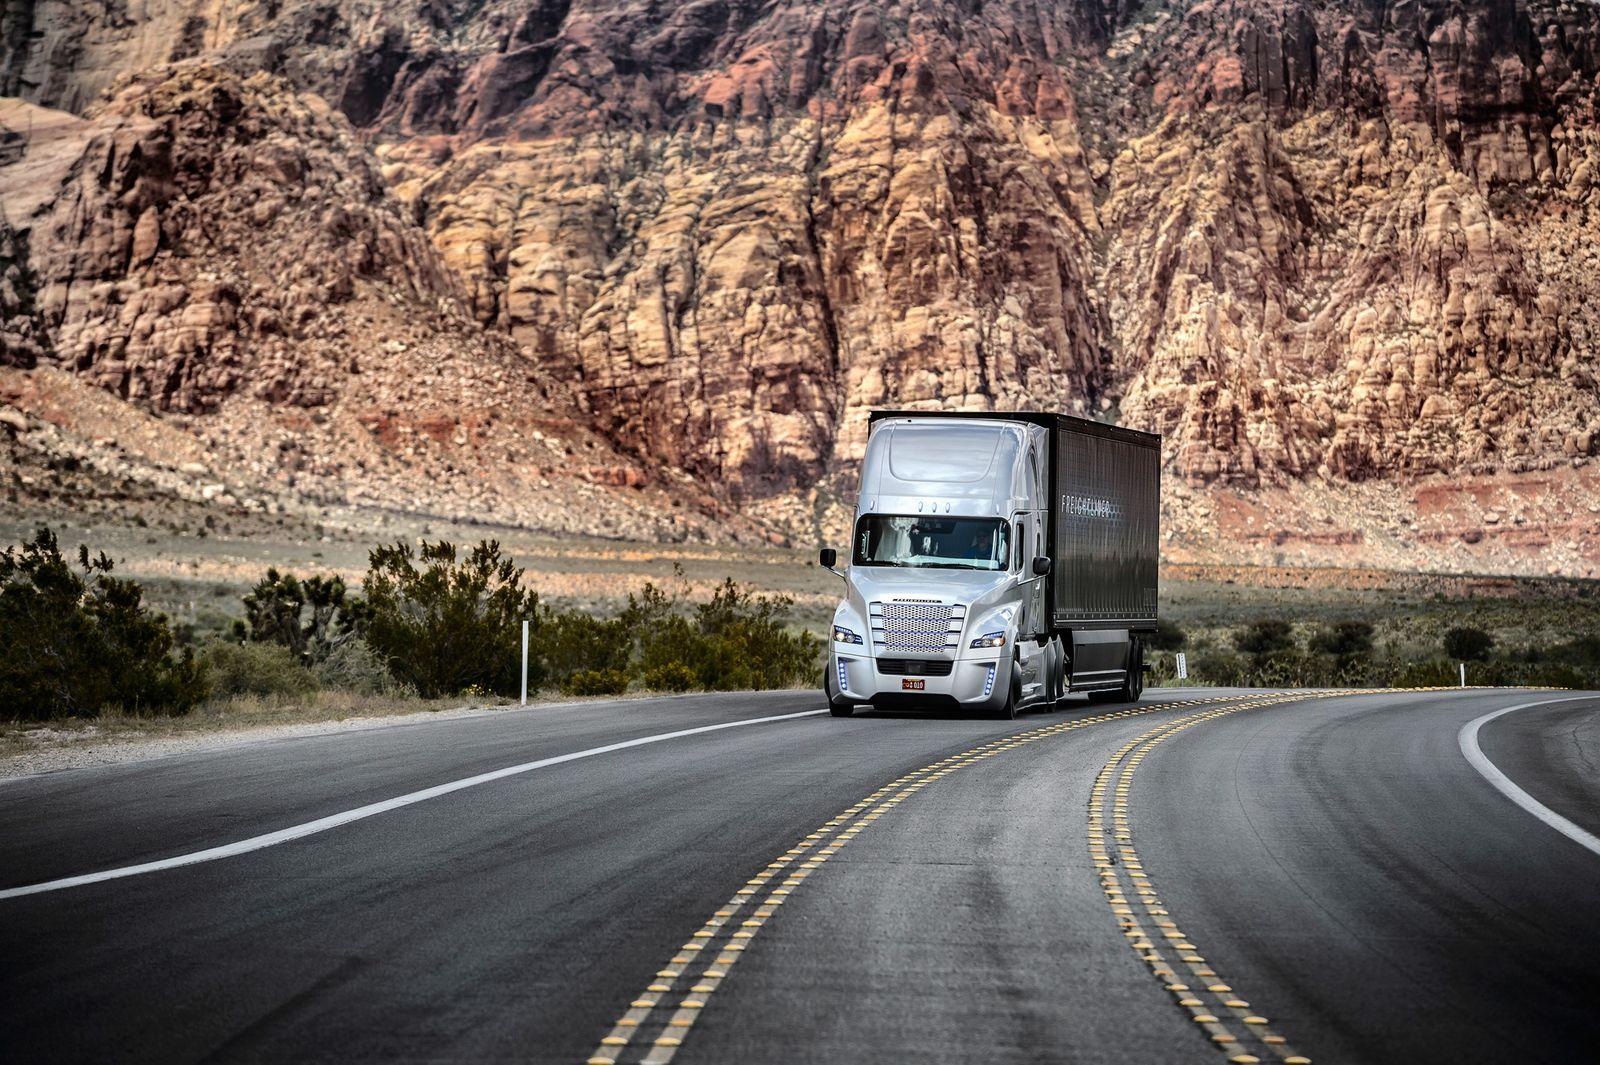 2015 / Freightliner Inspiration Truck